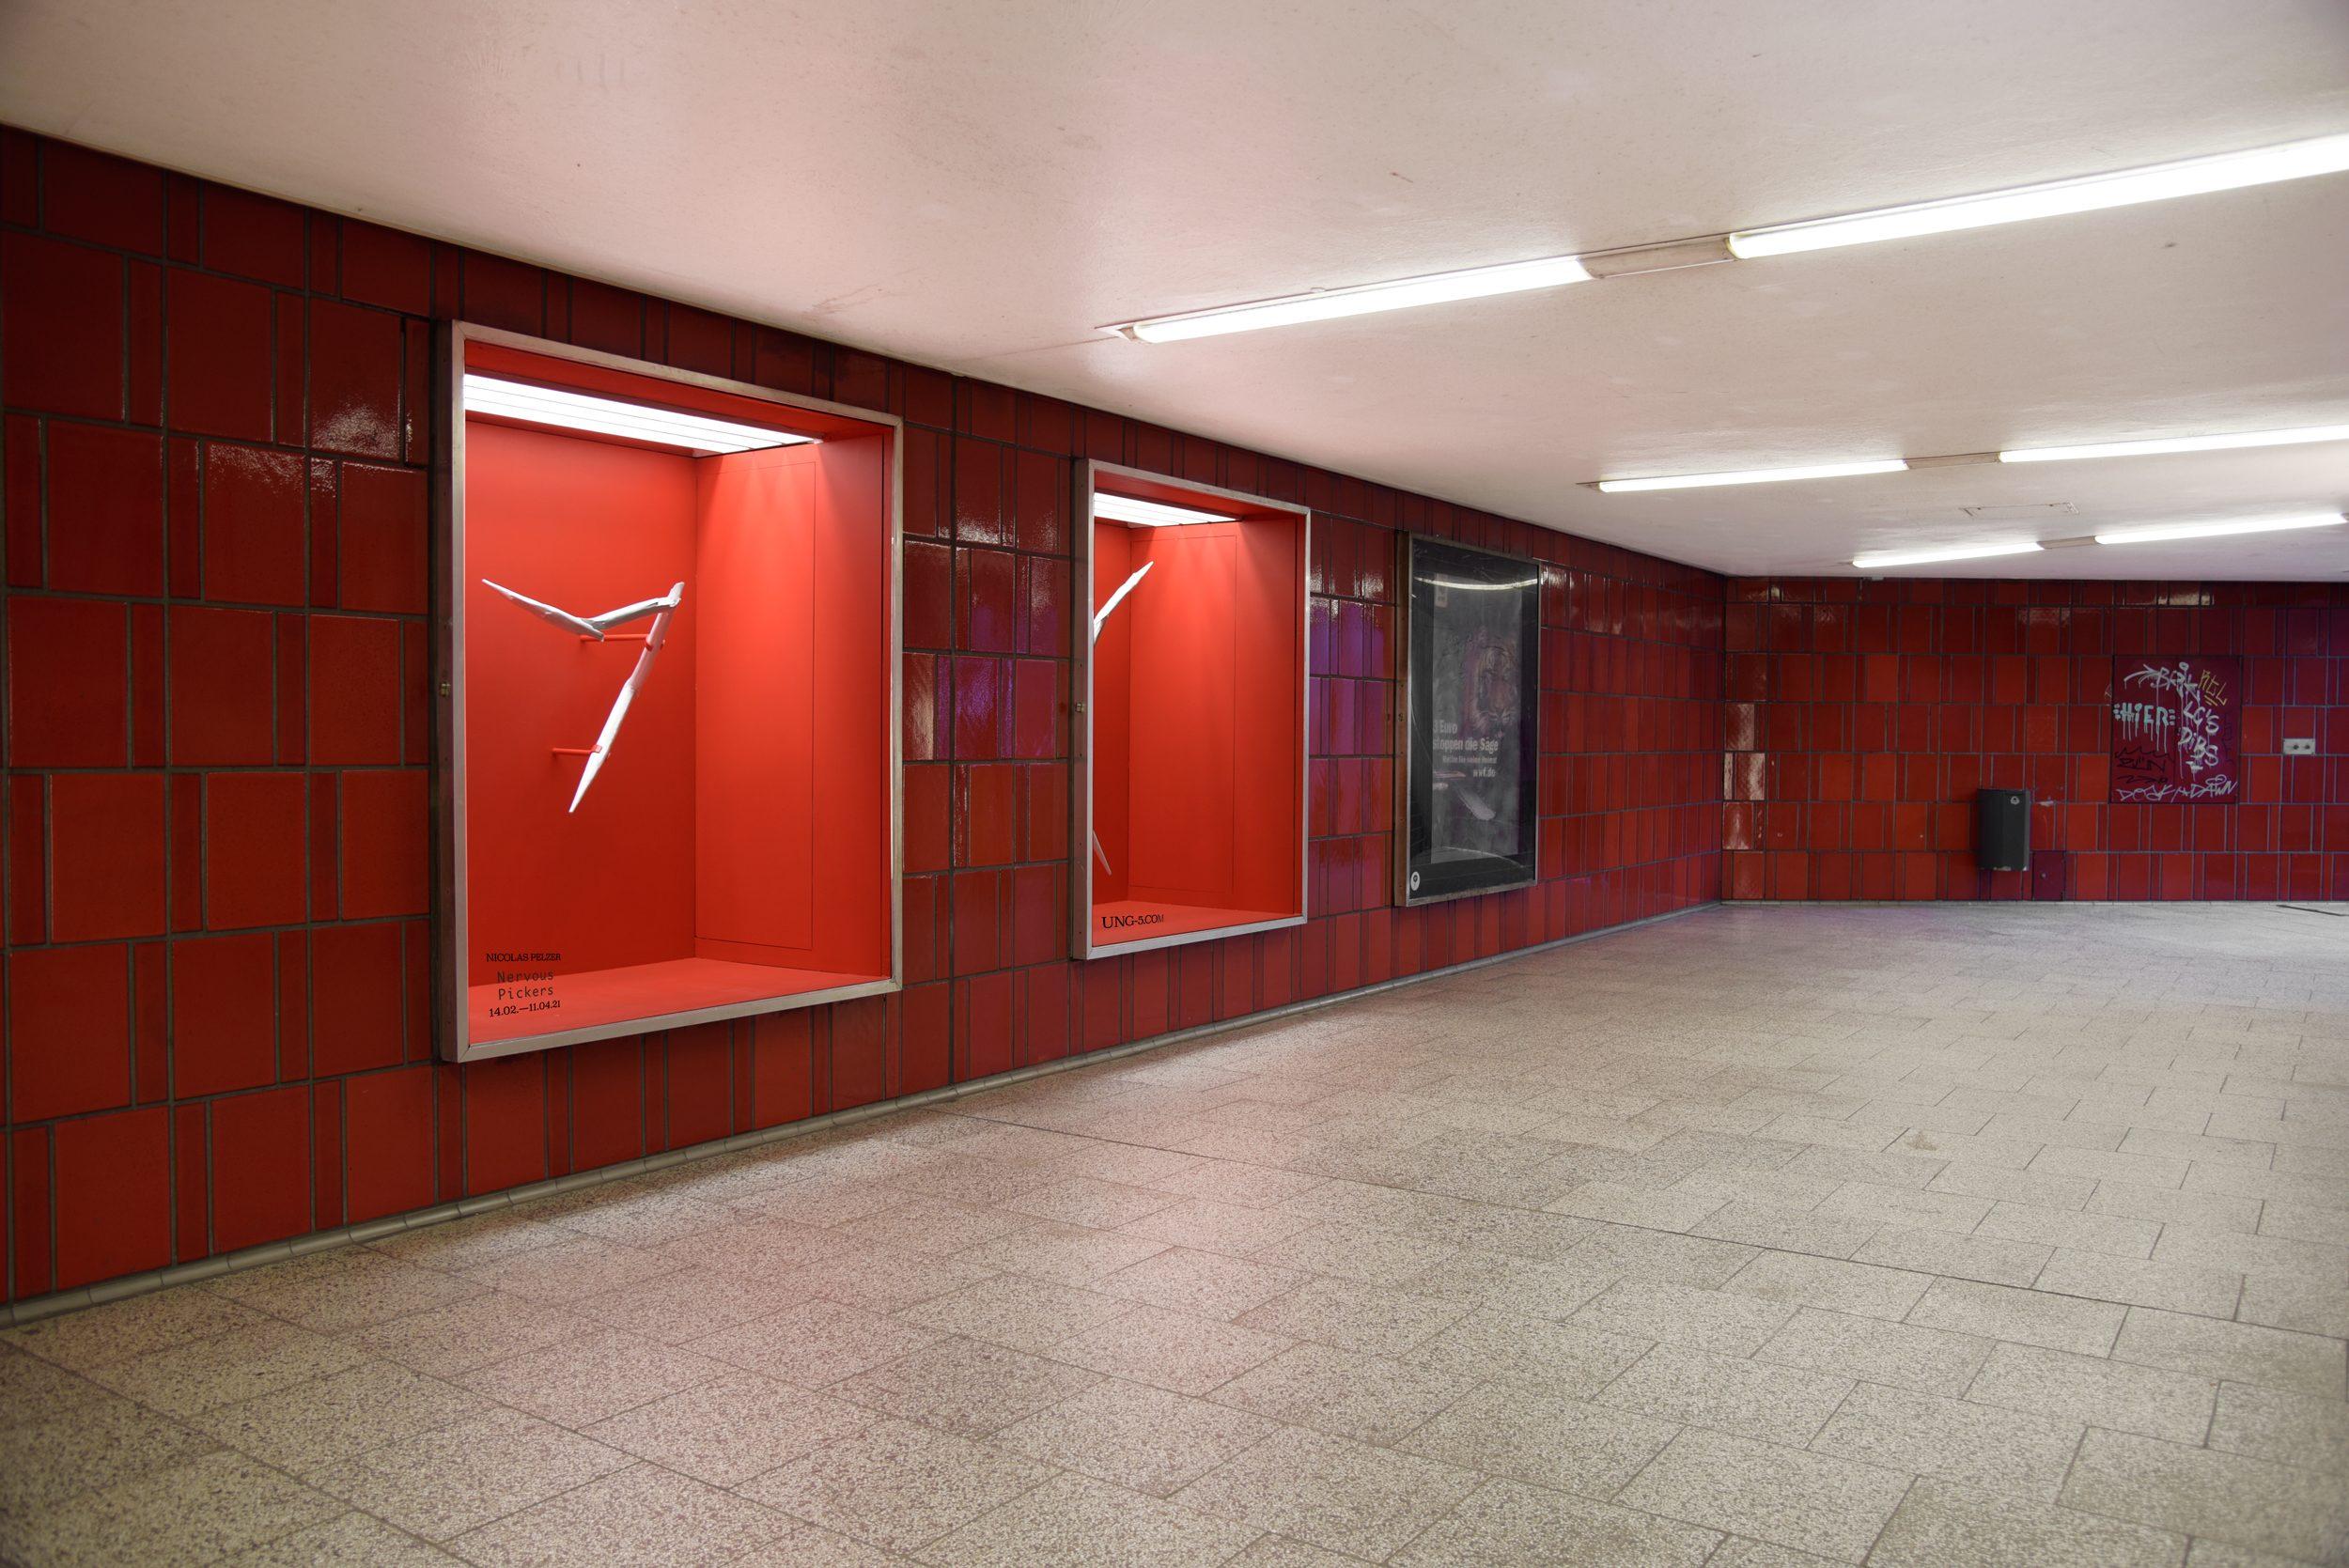 Nicolas Pelzer Nervous Pickers Installation View